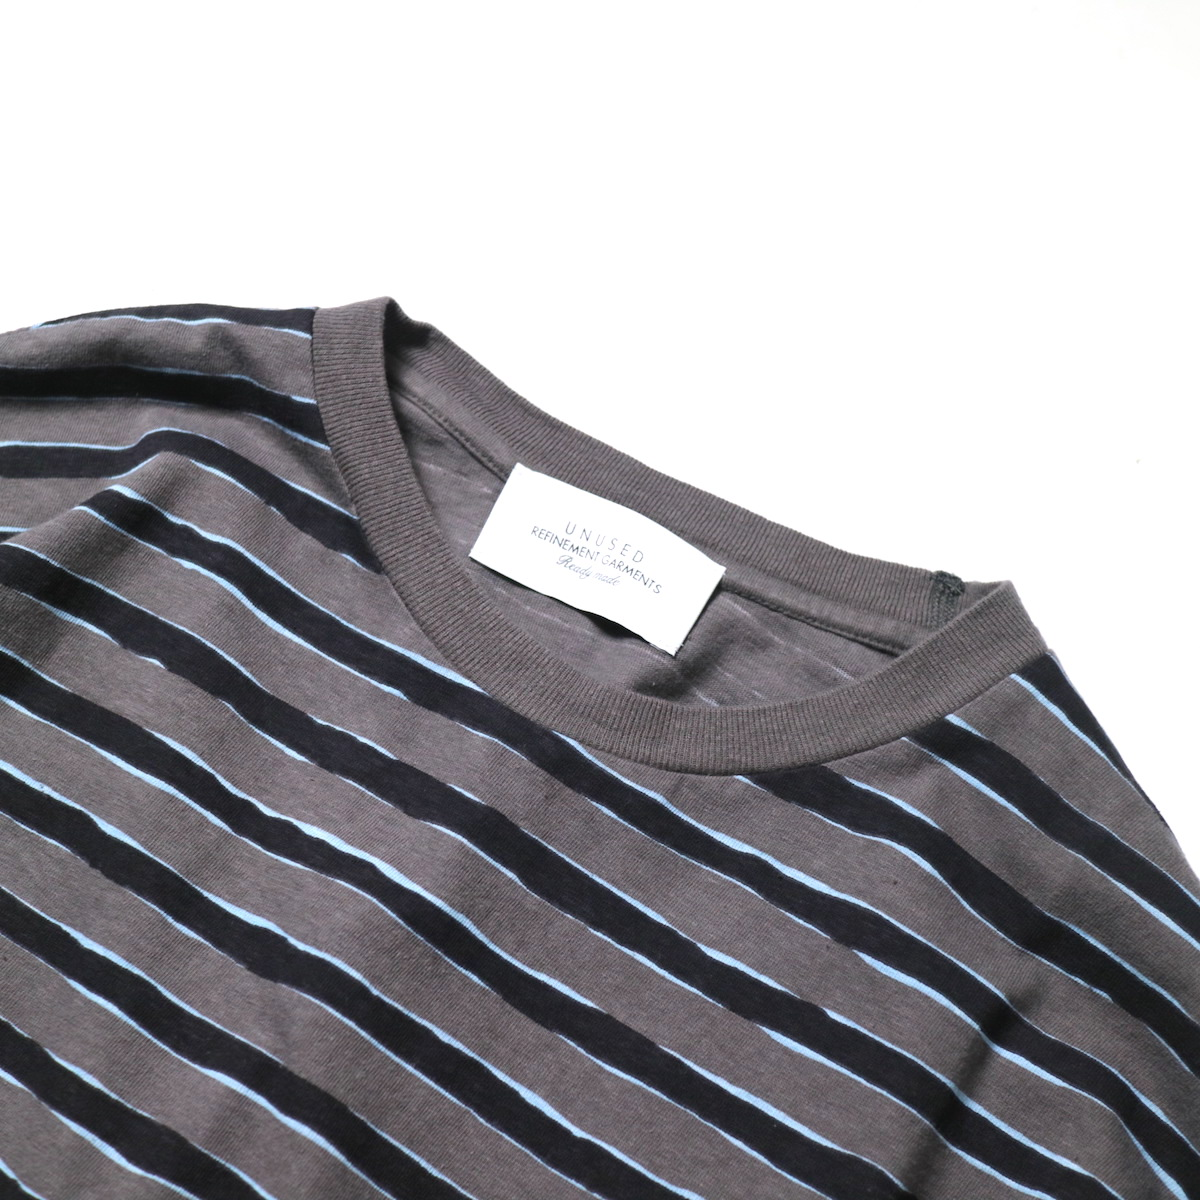 UNUSED / US2021 Short sleeve print border t-shirt (Charcoal × Black)ネック